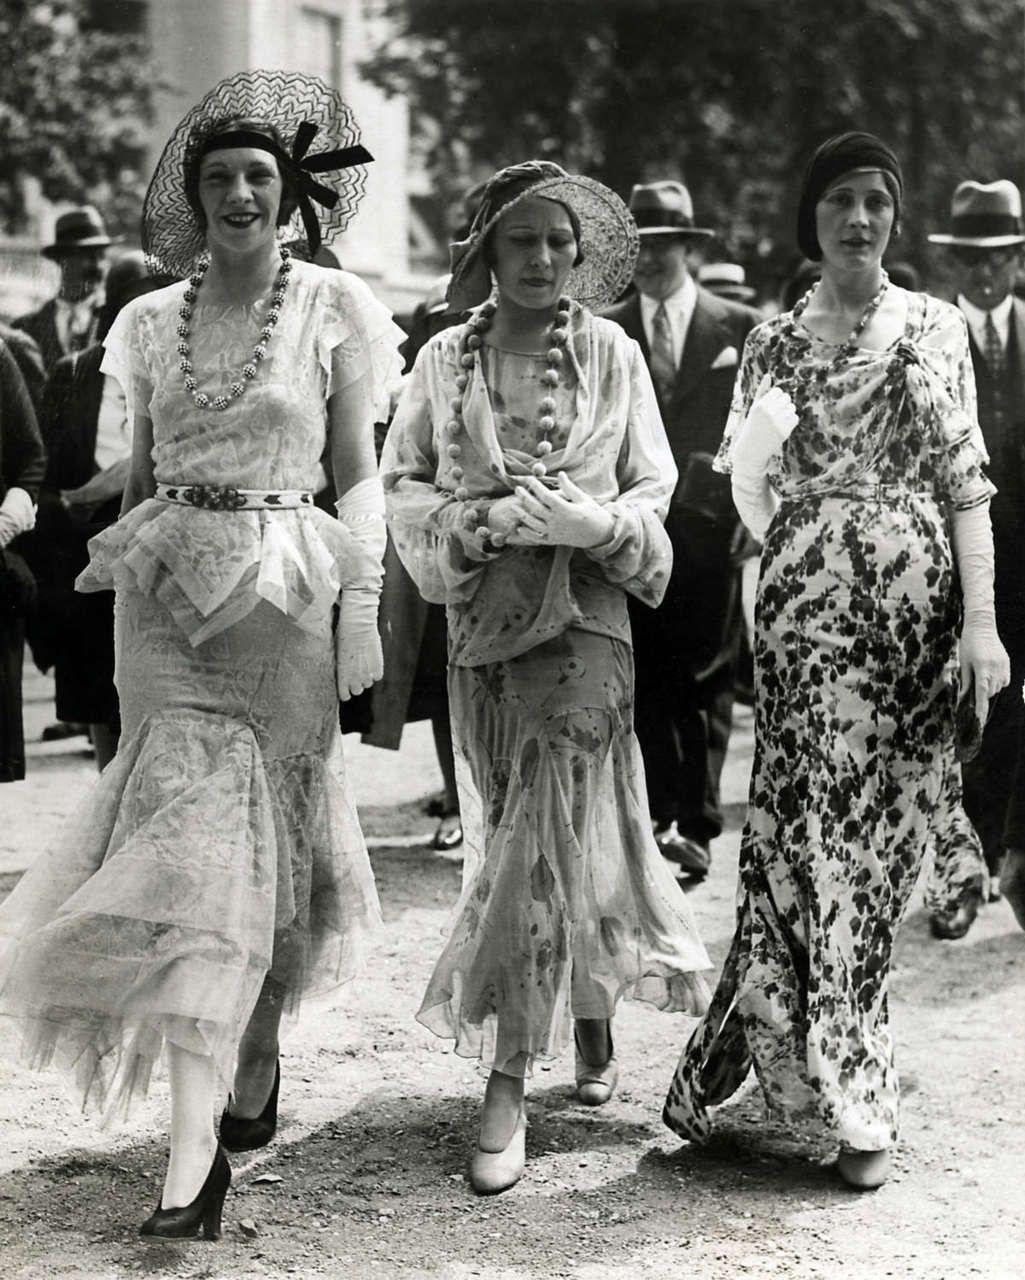 The Paris fashion of 1930s photo by Meurisse